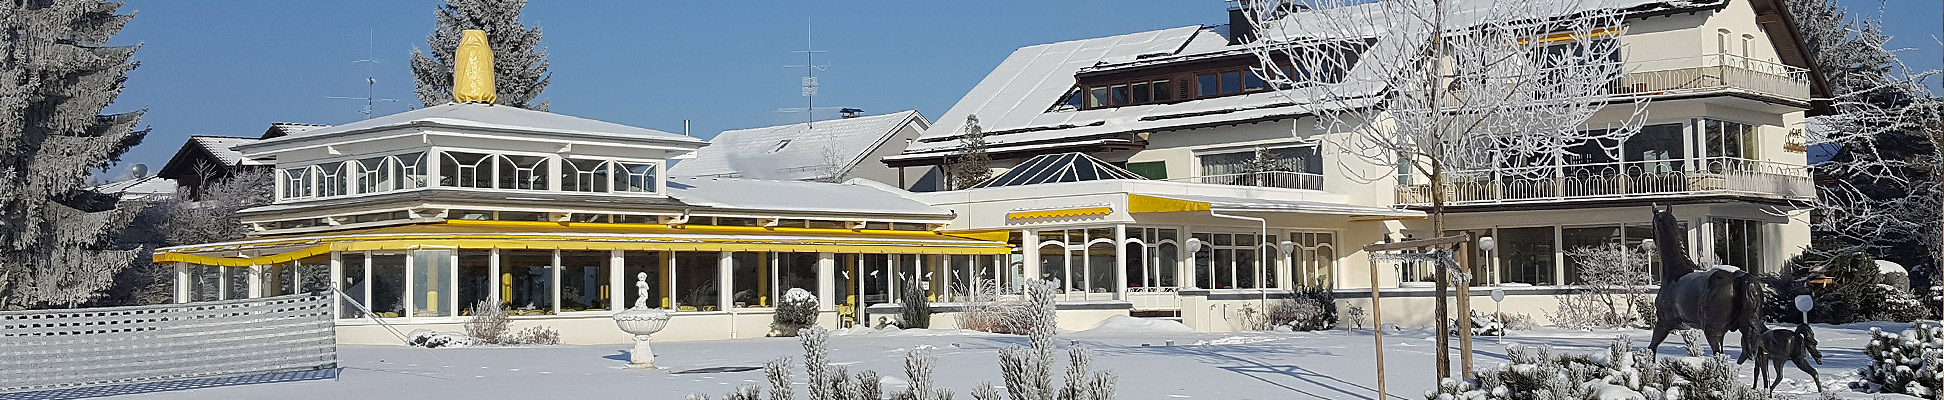 Café Schwermer 05 halb